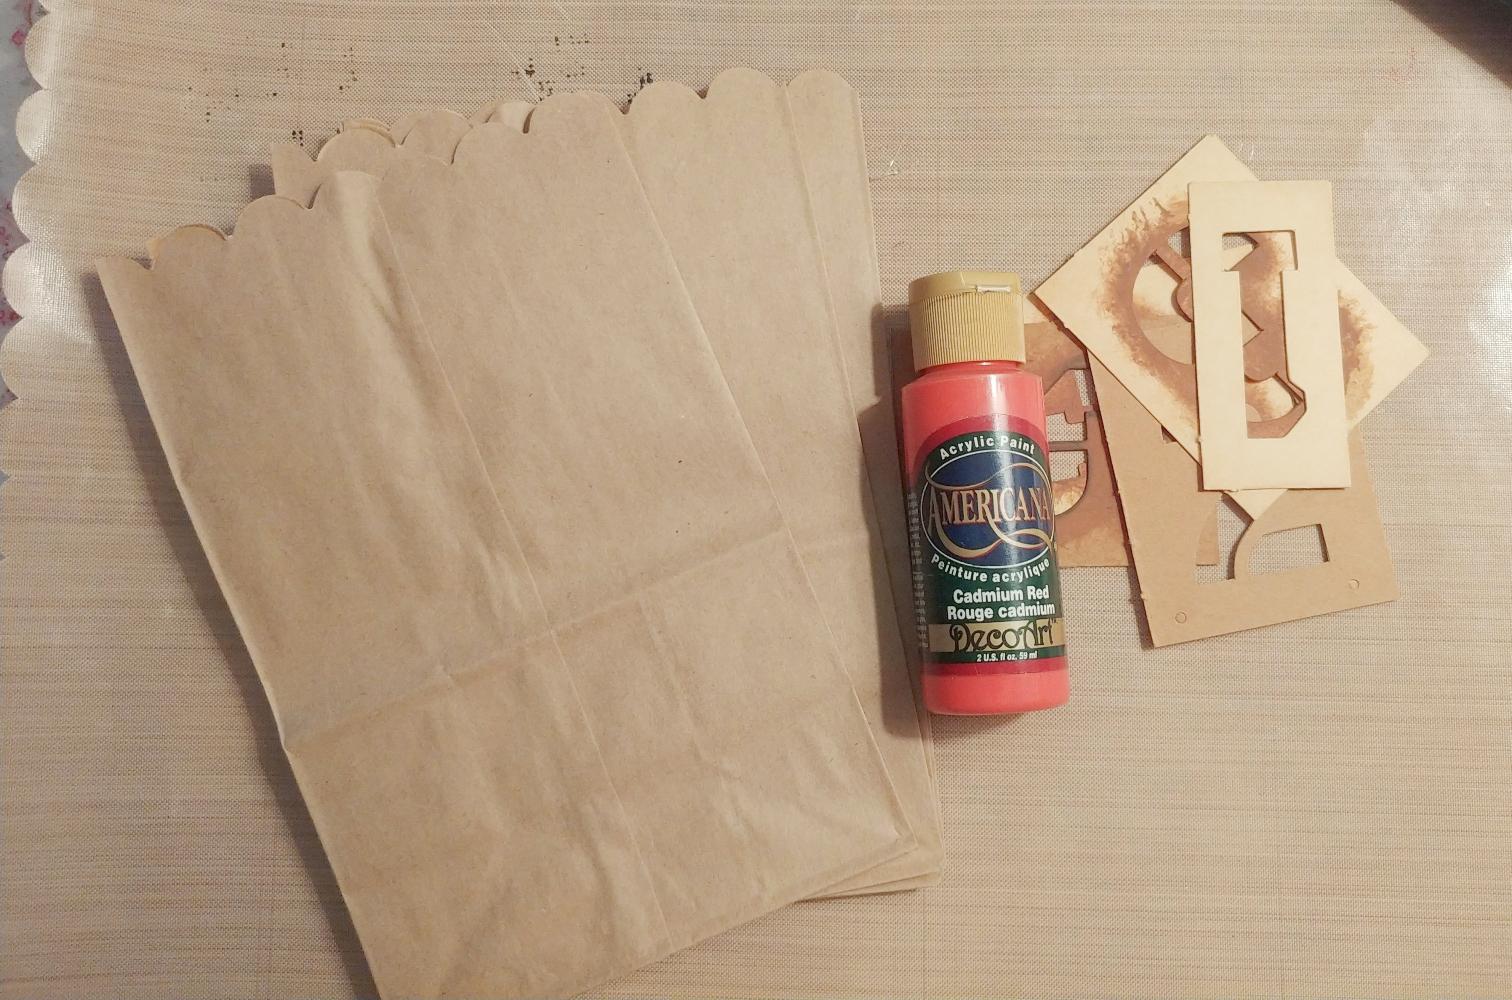 stencil supplies